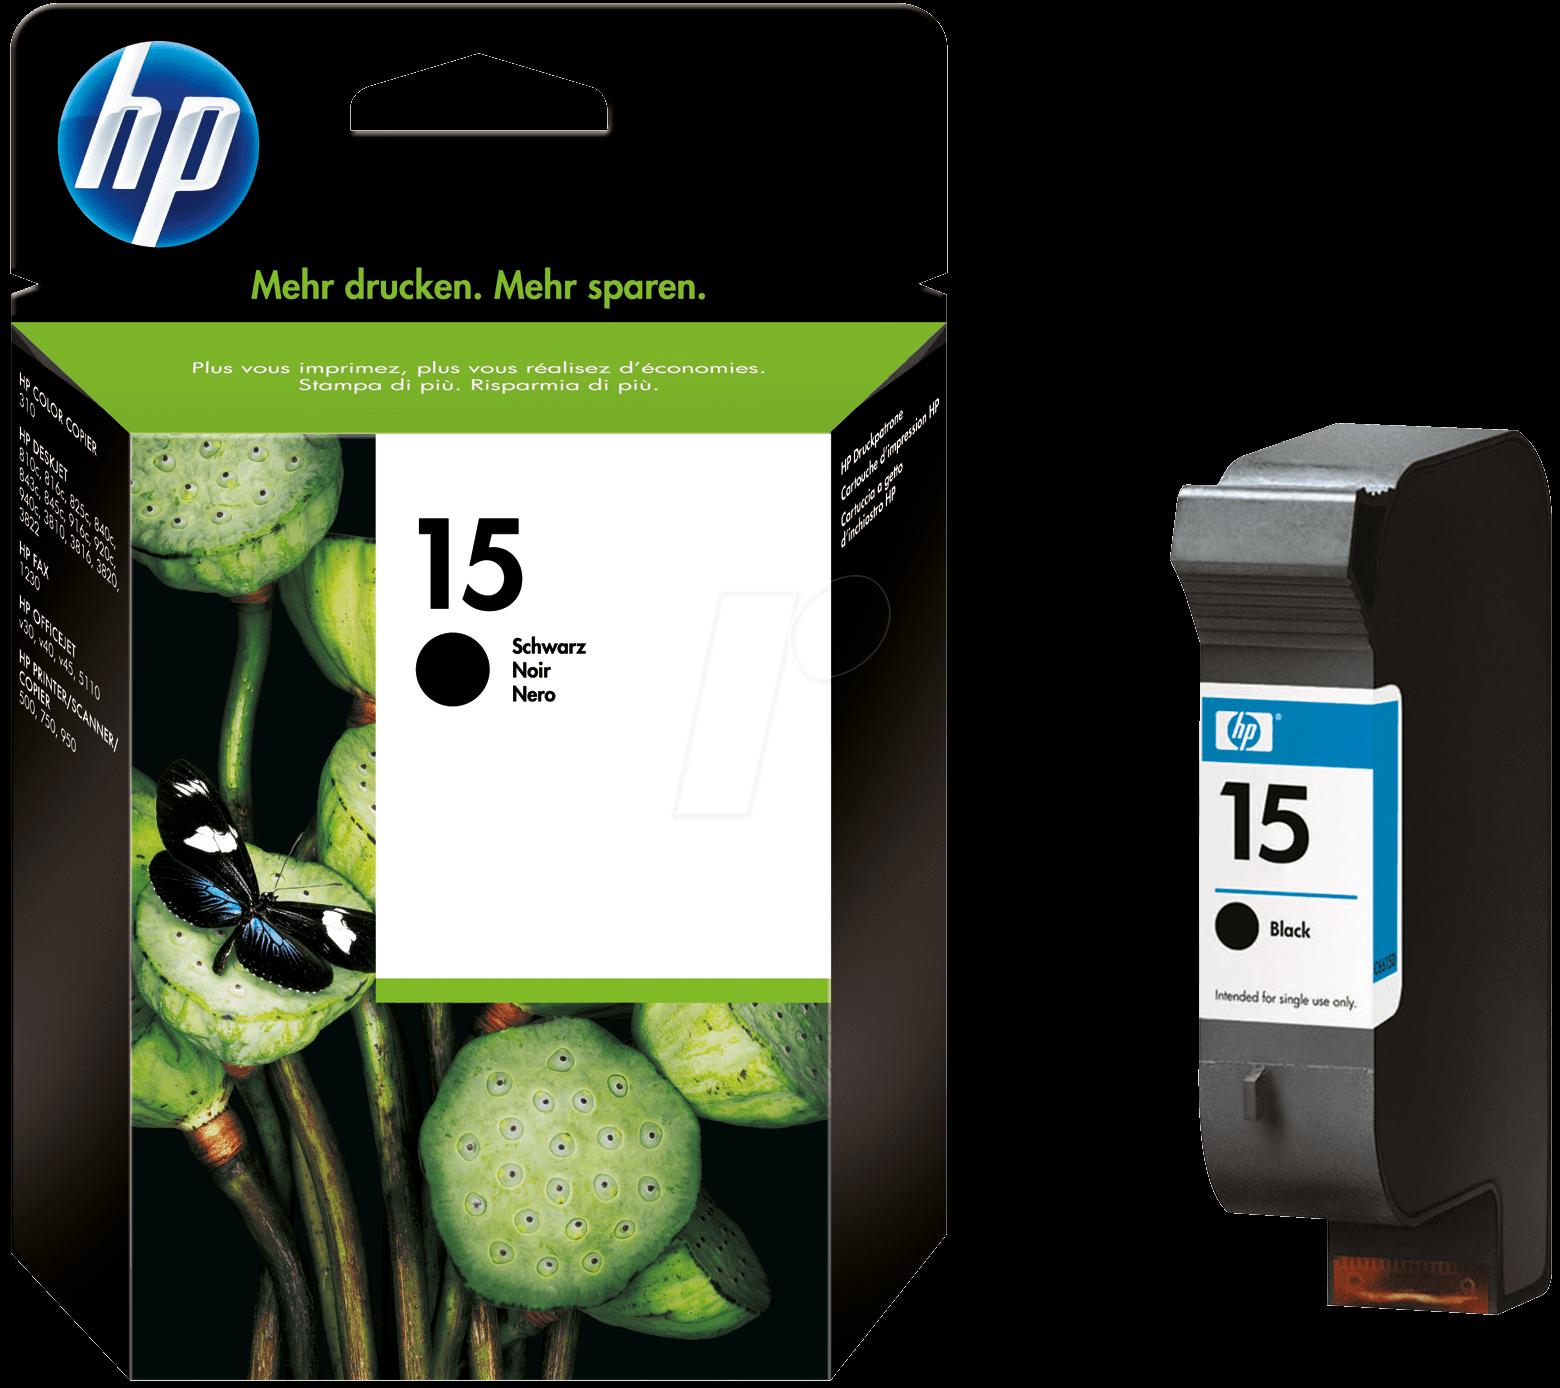 Tinteiro HP DeskJet 810C/816C (C6615D) Nº15 Preto